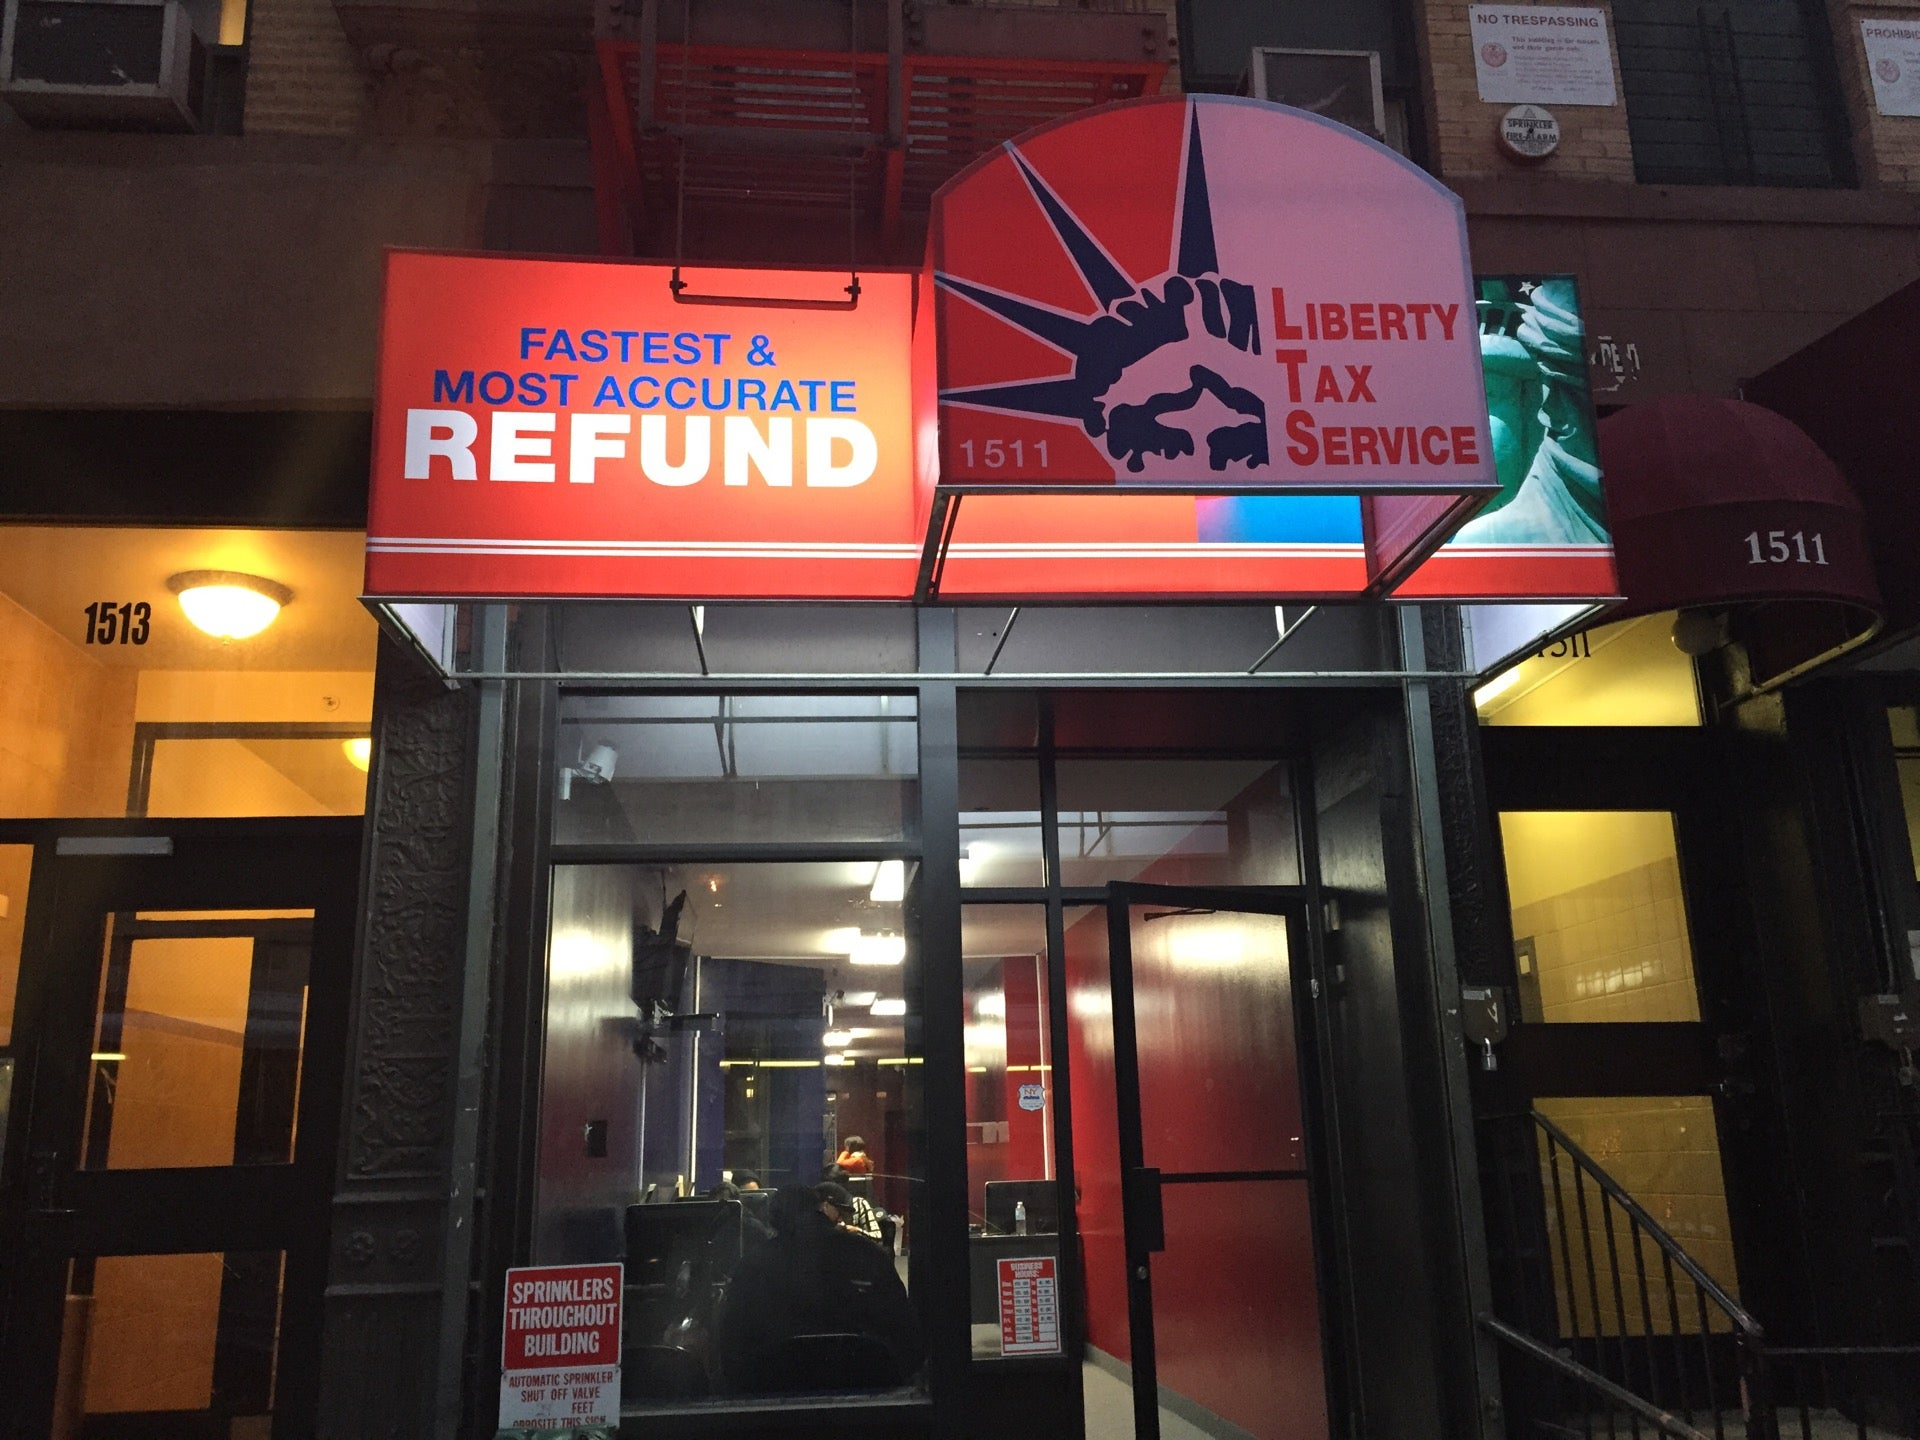 Liberty Tax Service,